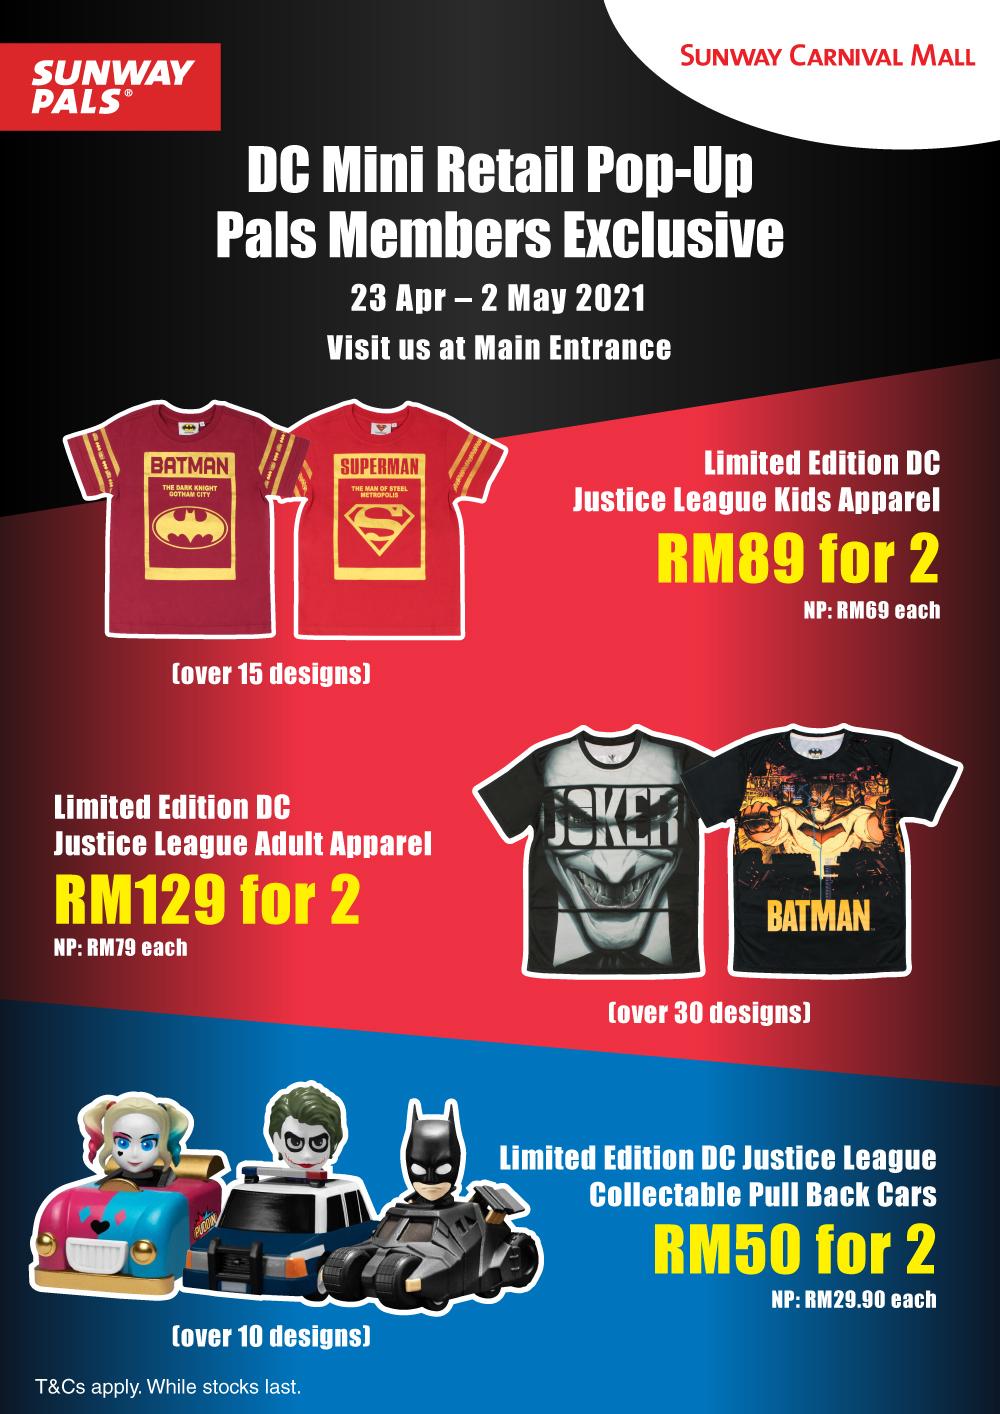 Member Price On L.E. DC Merchandises